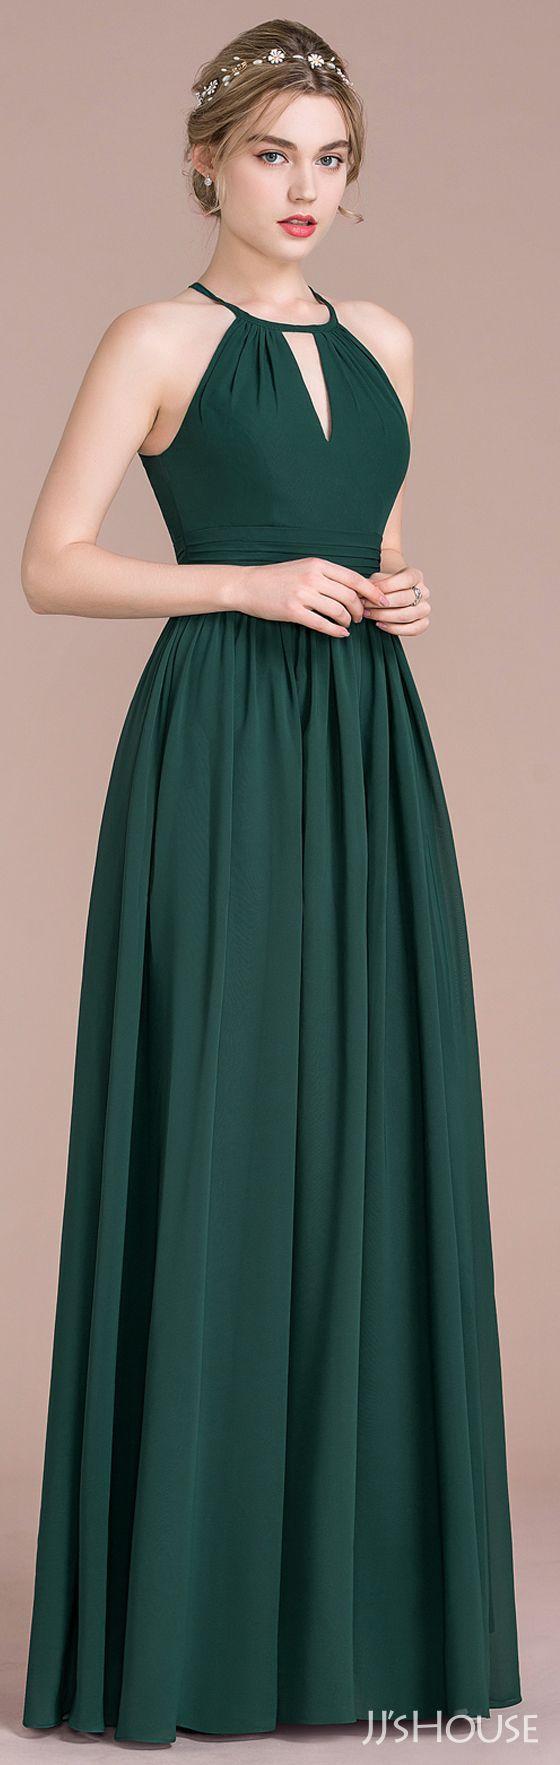 Alineprincess scoop neck floorlength chiffon bridesmaid dress